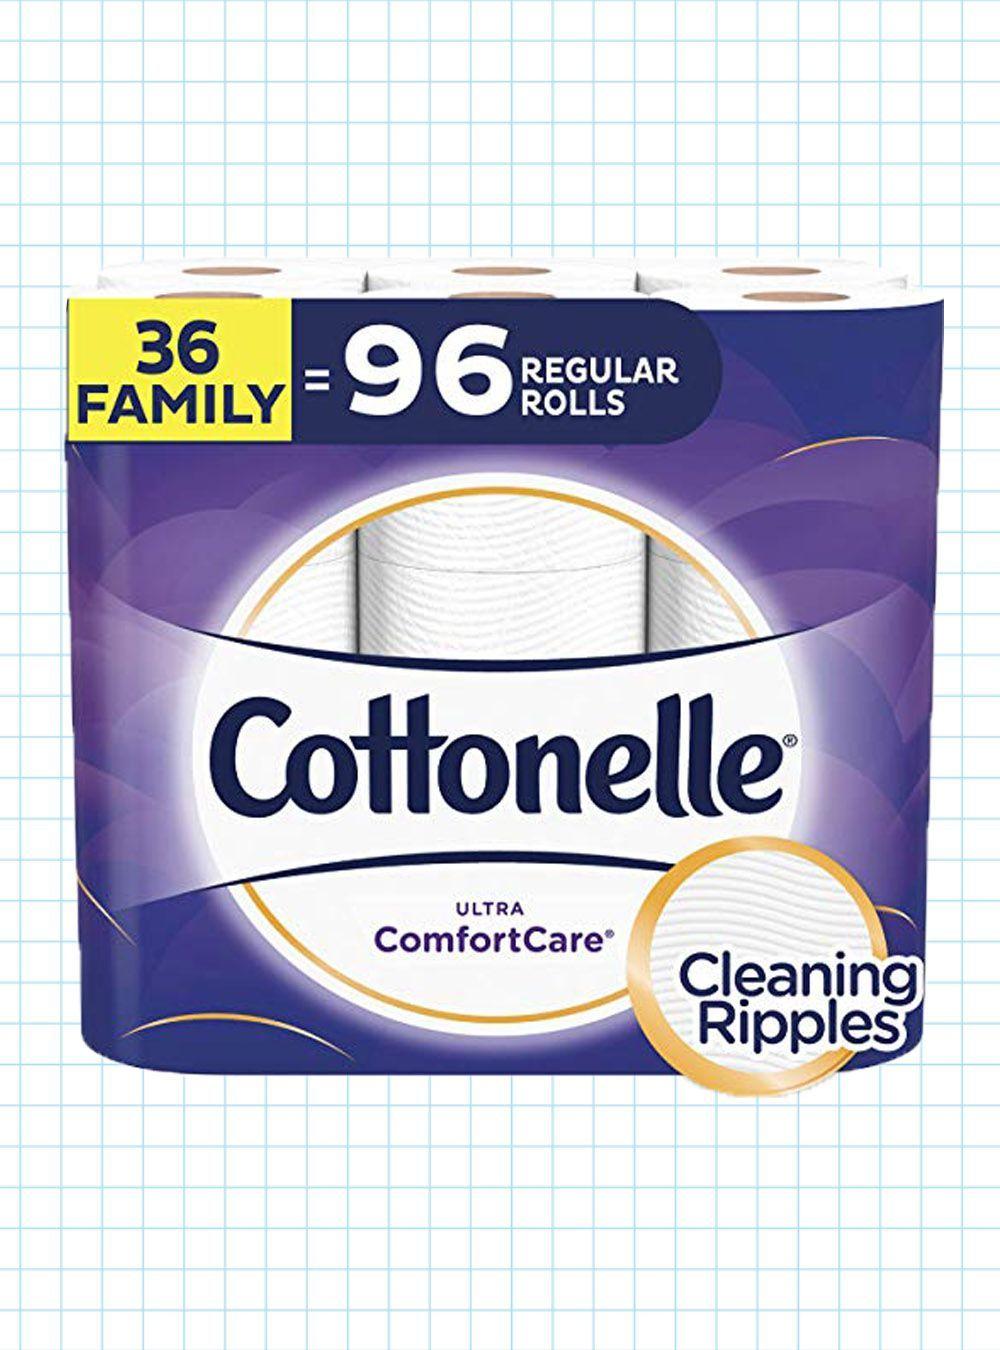 Ultra ComfortCare Toilet Paper